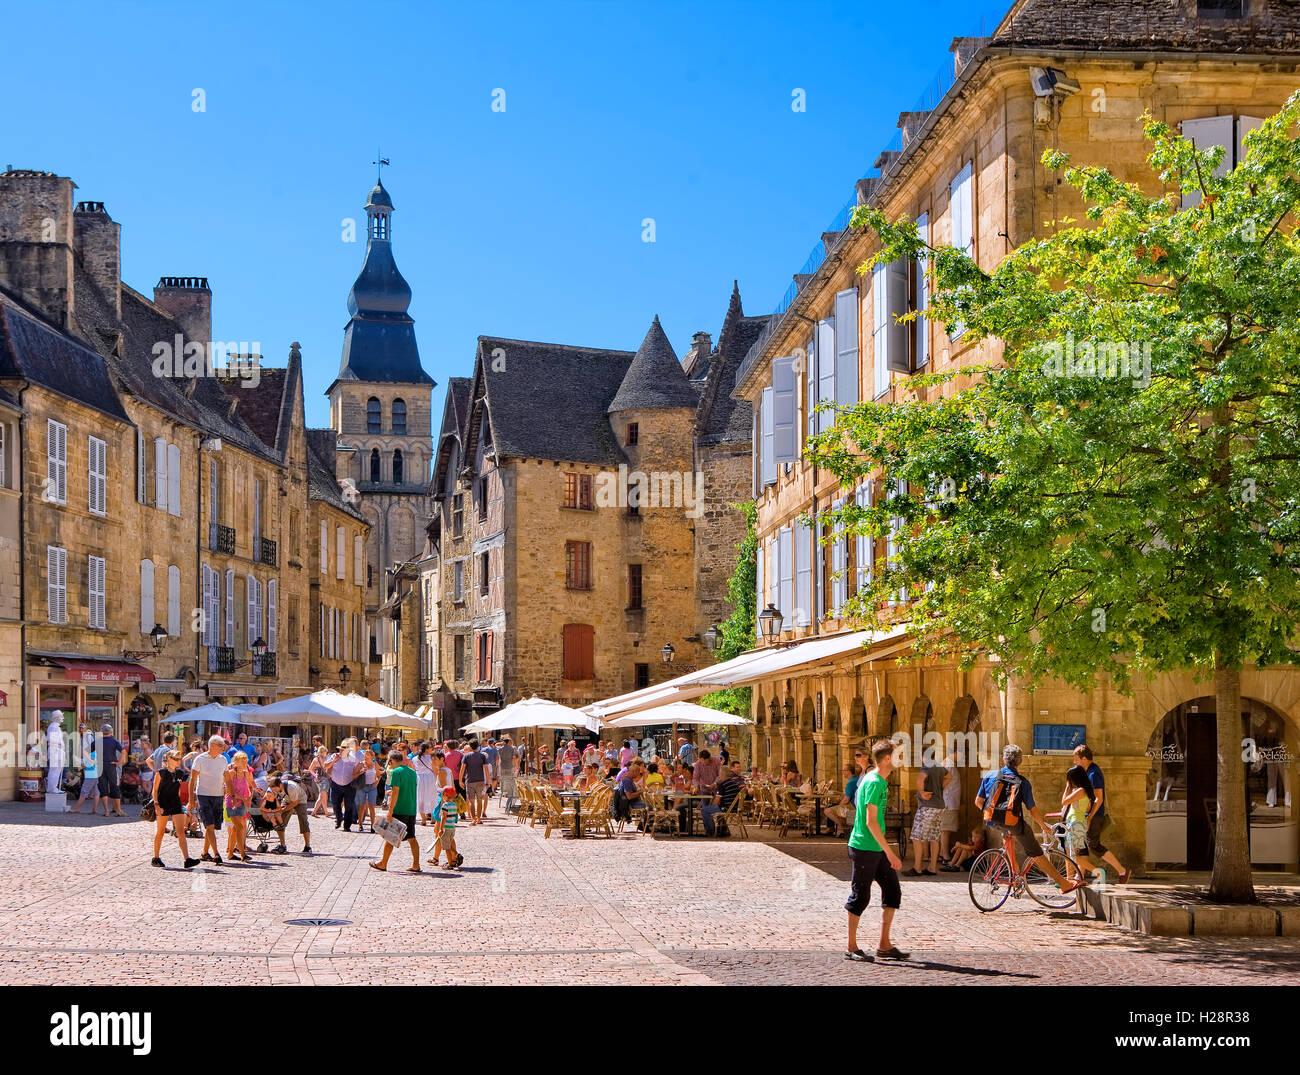 la place de la Liberte  in the old town of Sarlat,  Dordogne, France Stock Photo